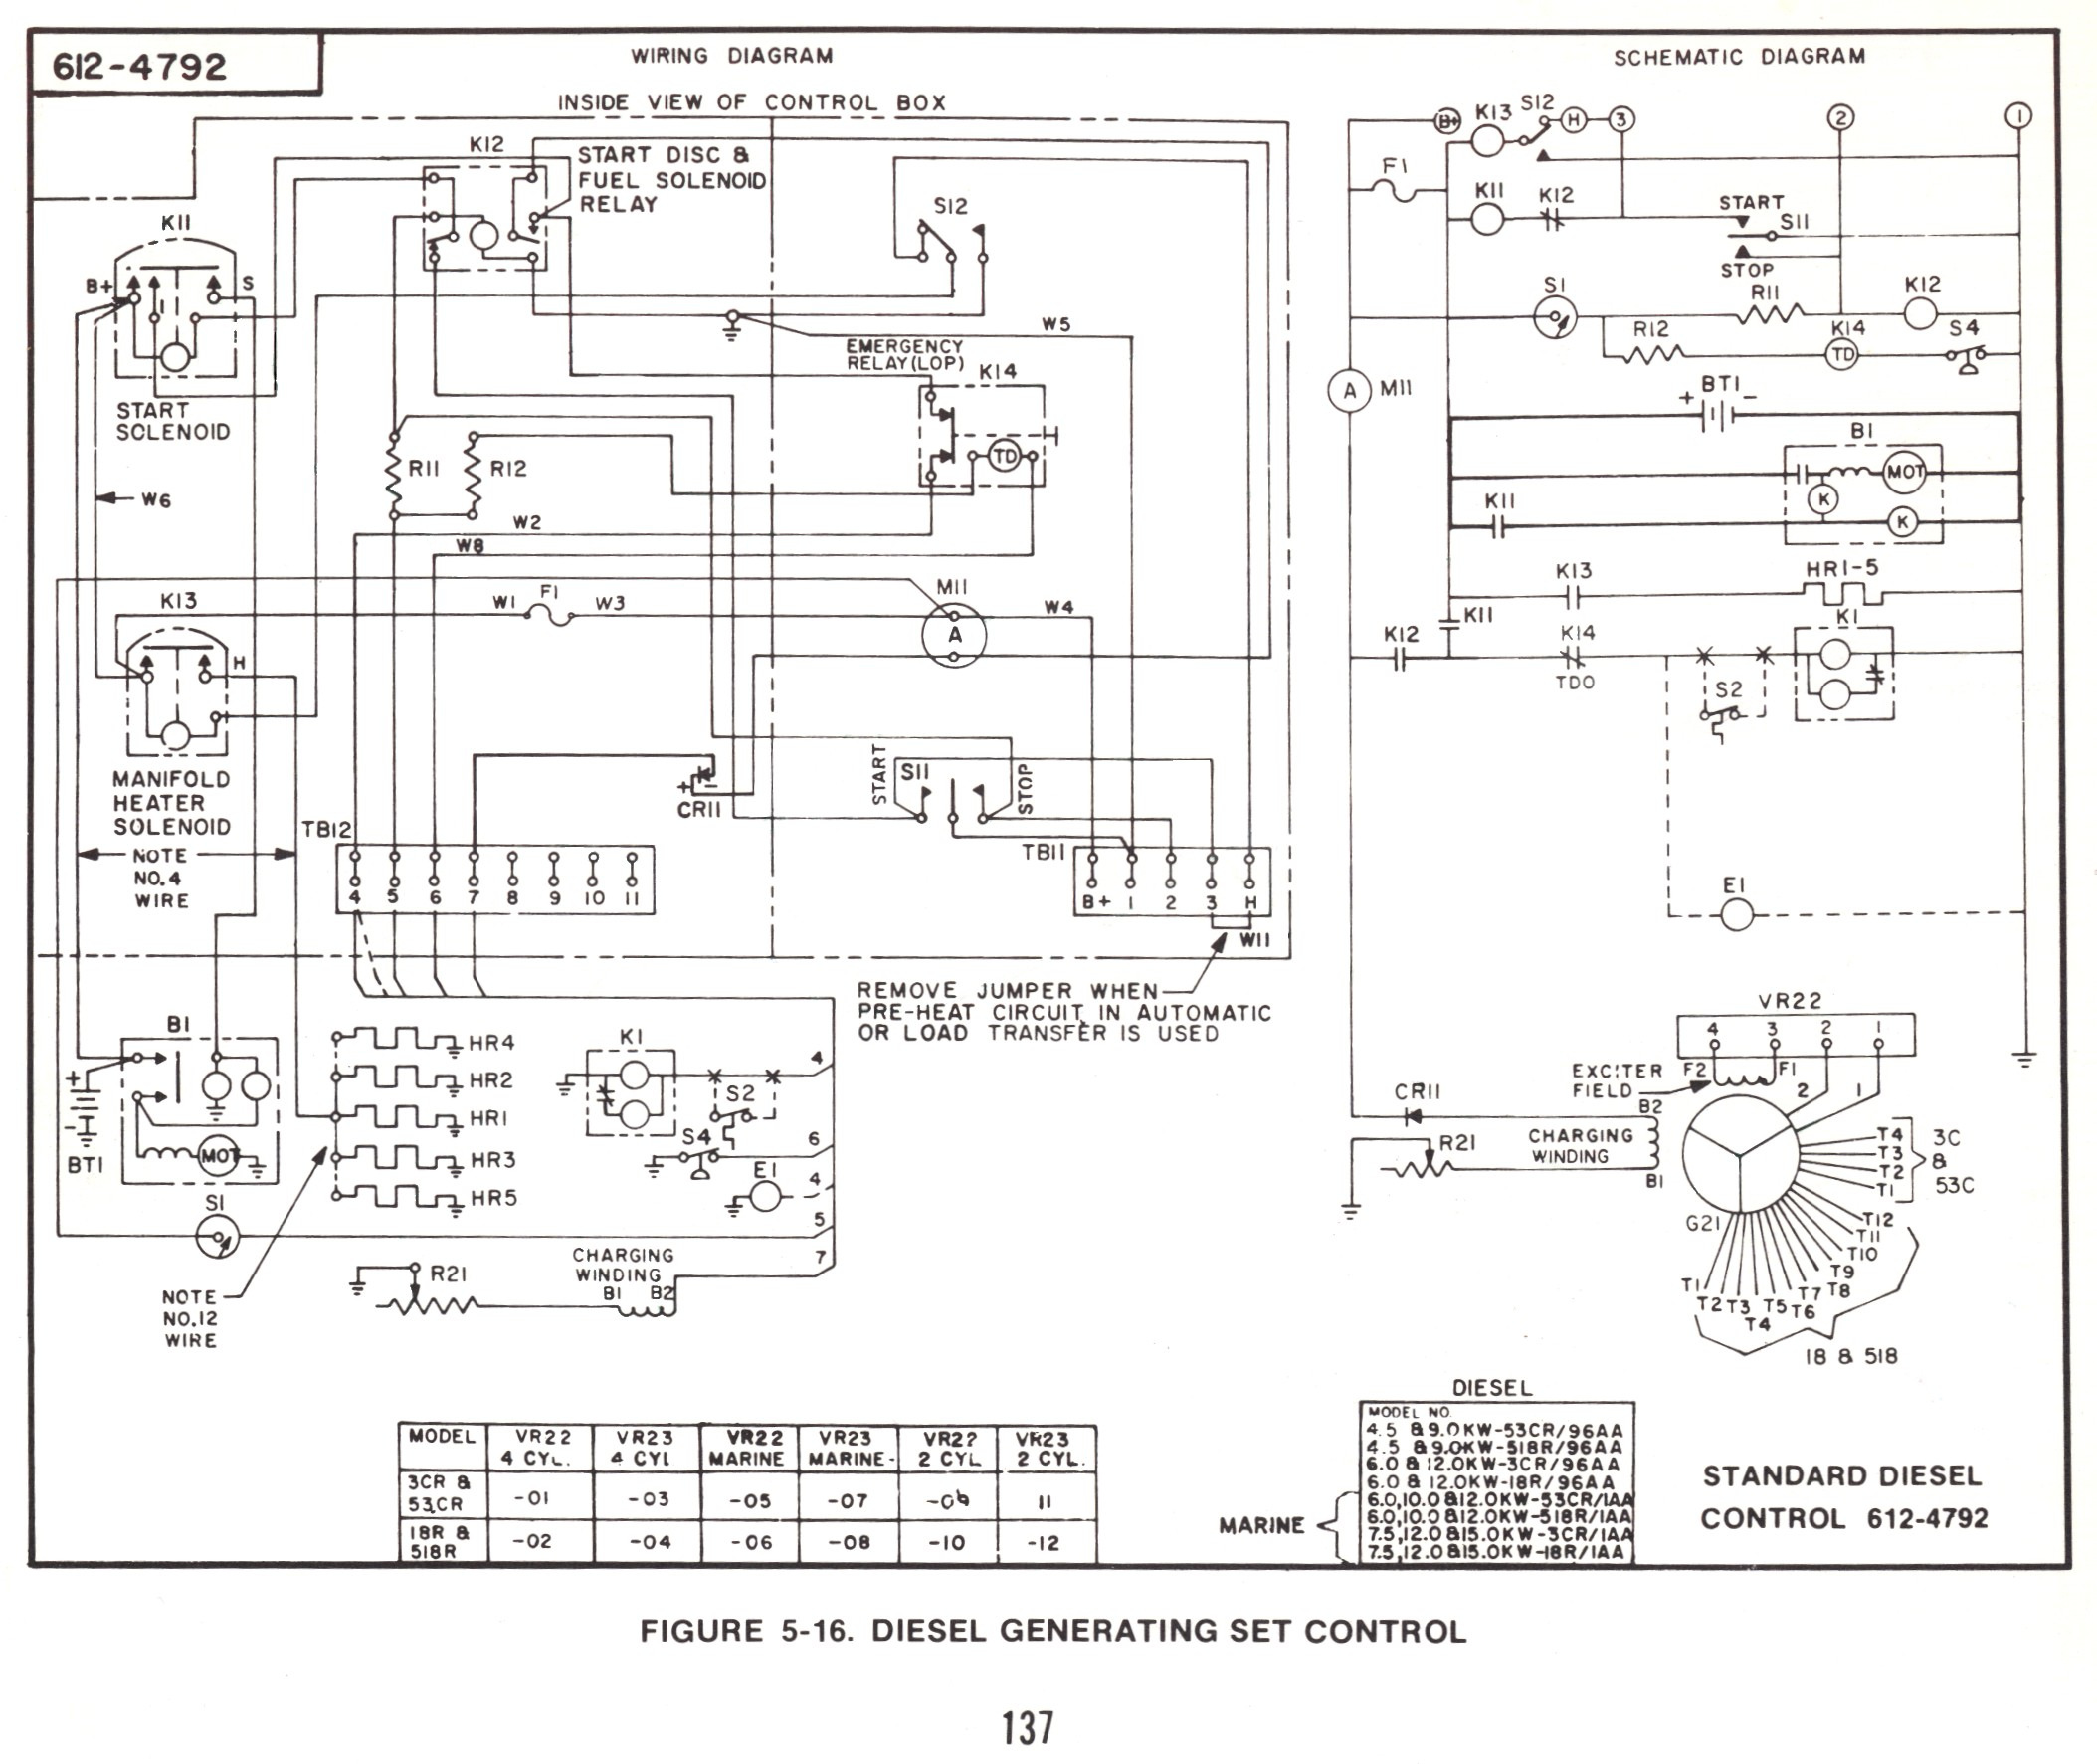 Onan Engine Parts Diagram An Stuff In Rv Generator Wiring Diagram for Wiring Diagram Of Onan Engine Parts Diagram